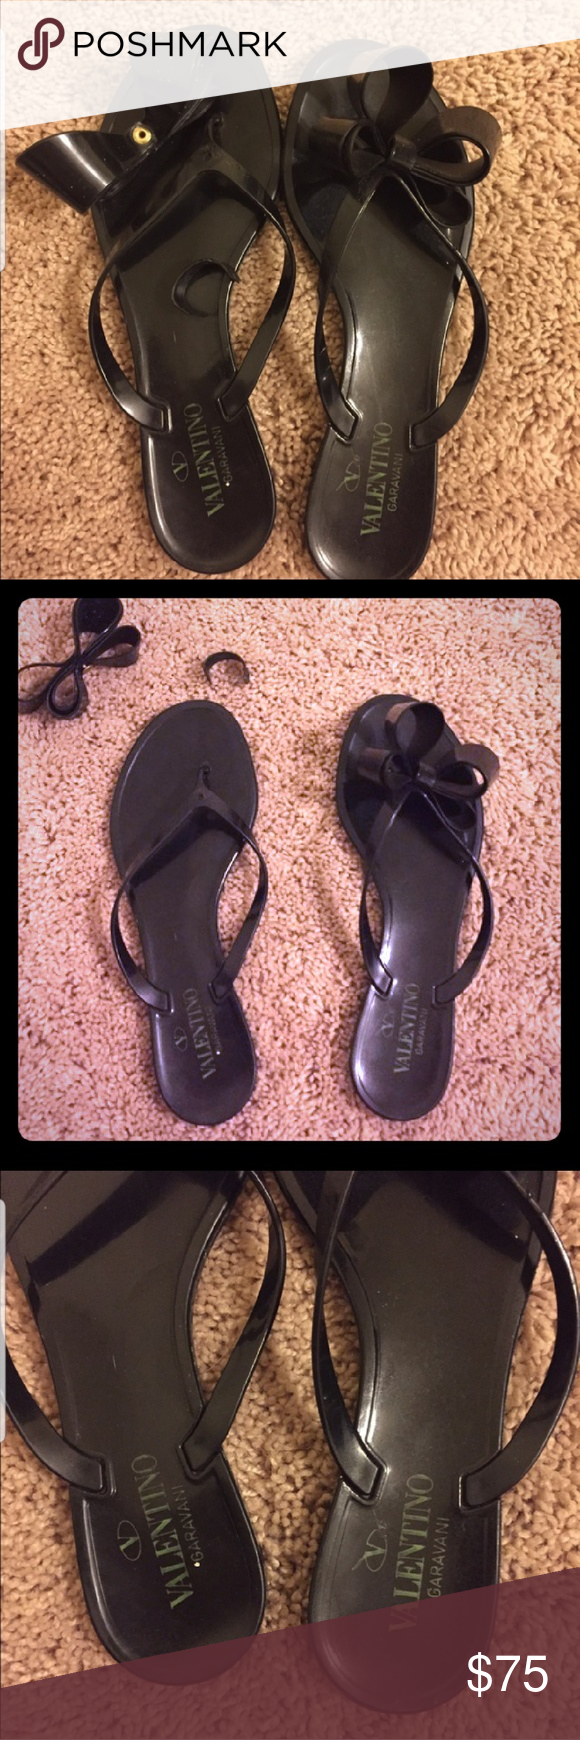 Valentino sandals, Valentino, Bow sandals